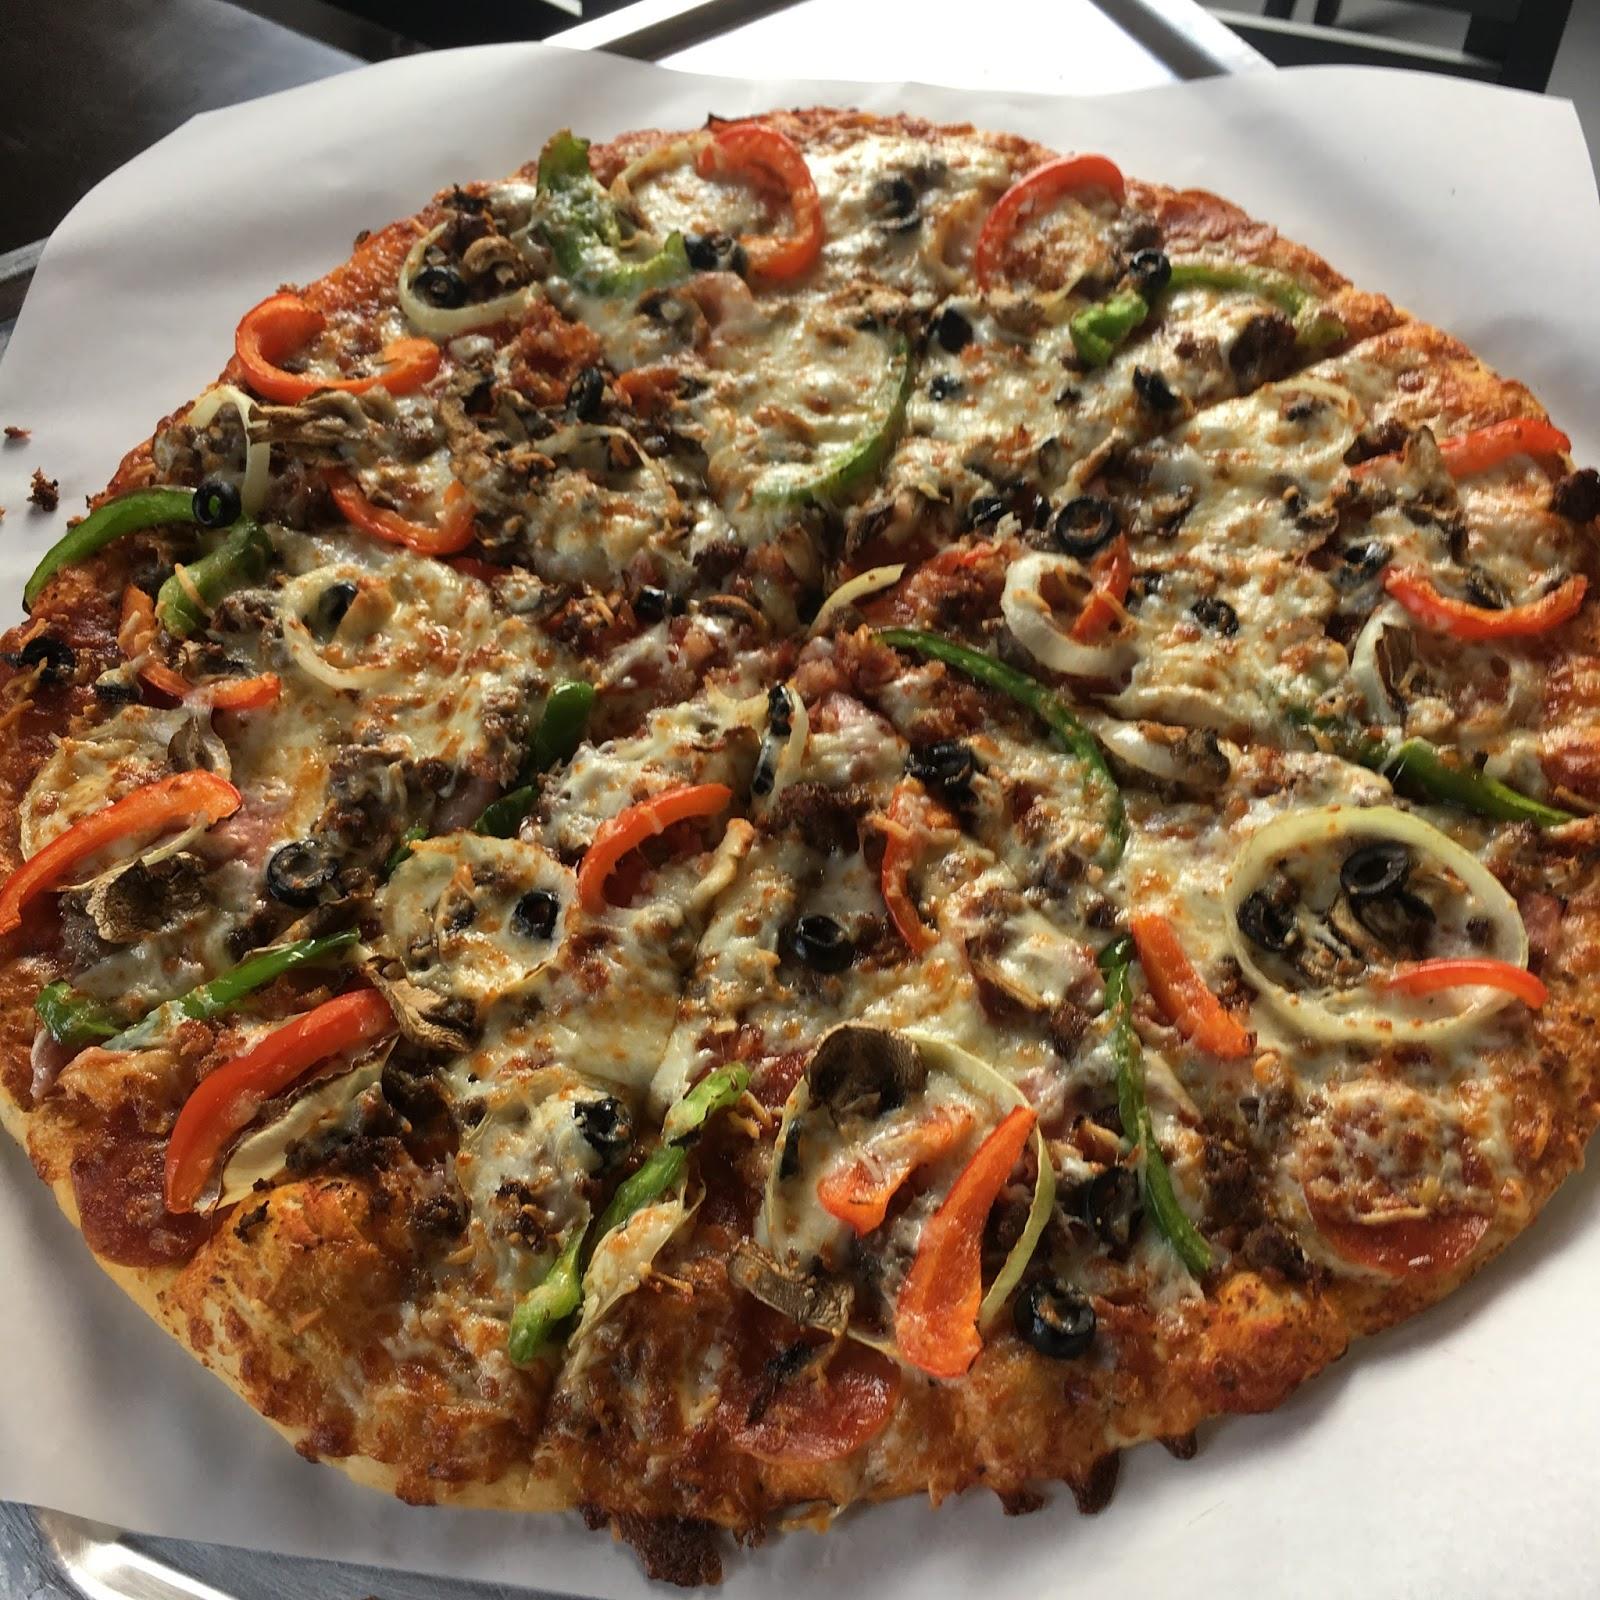 TASTE OF HAWAII YELLOW CAB PIZZA PANY